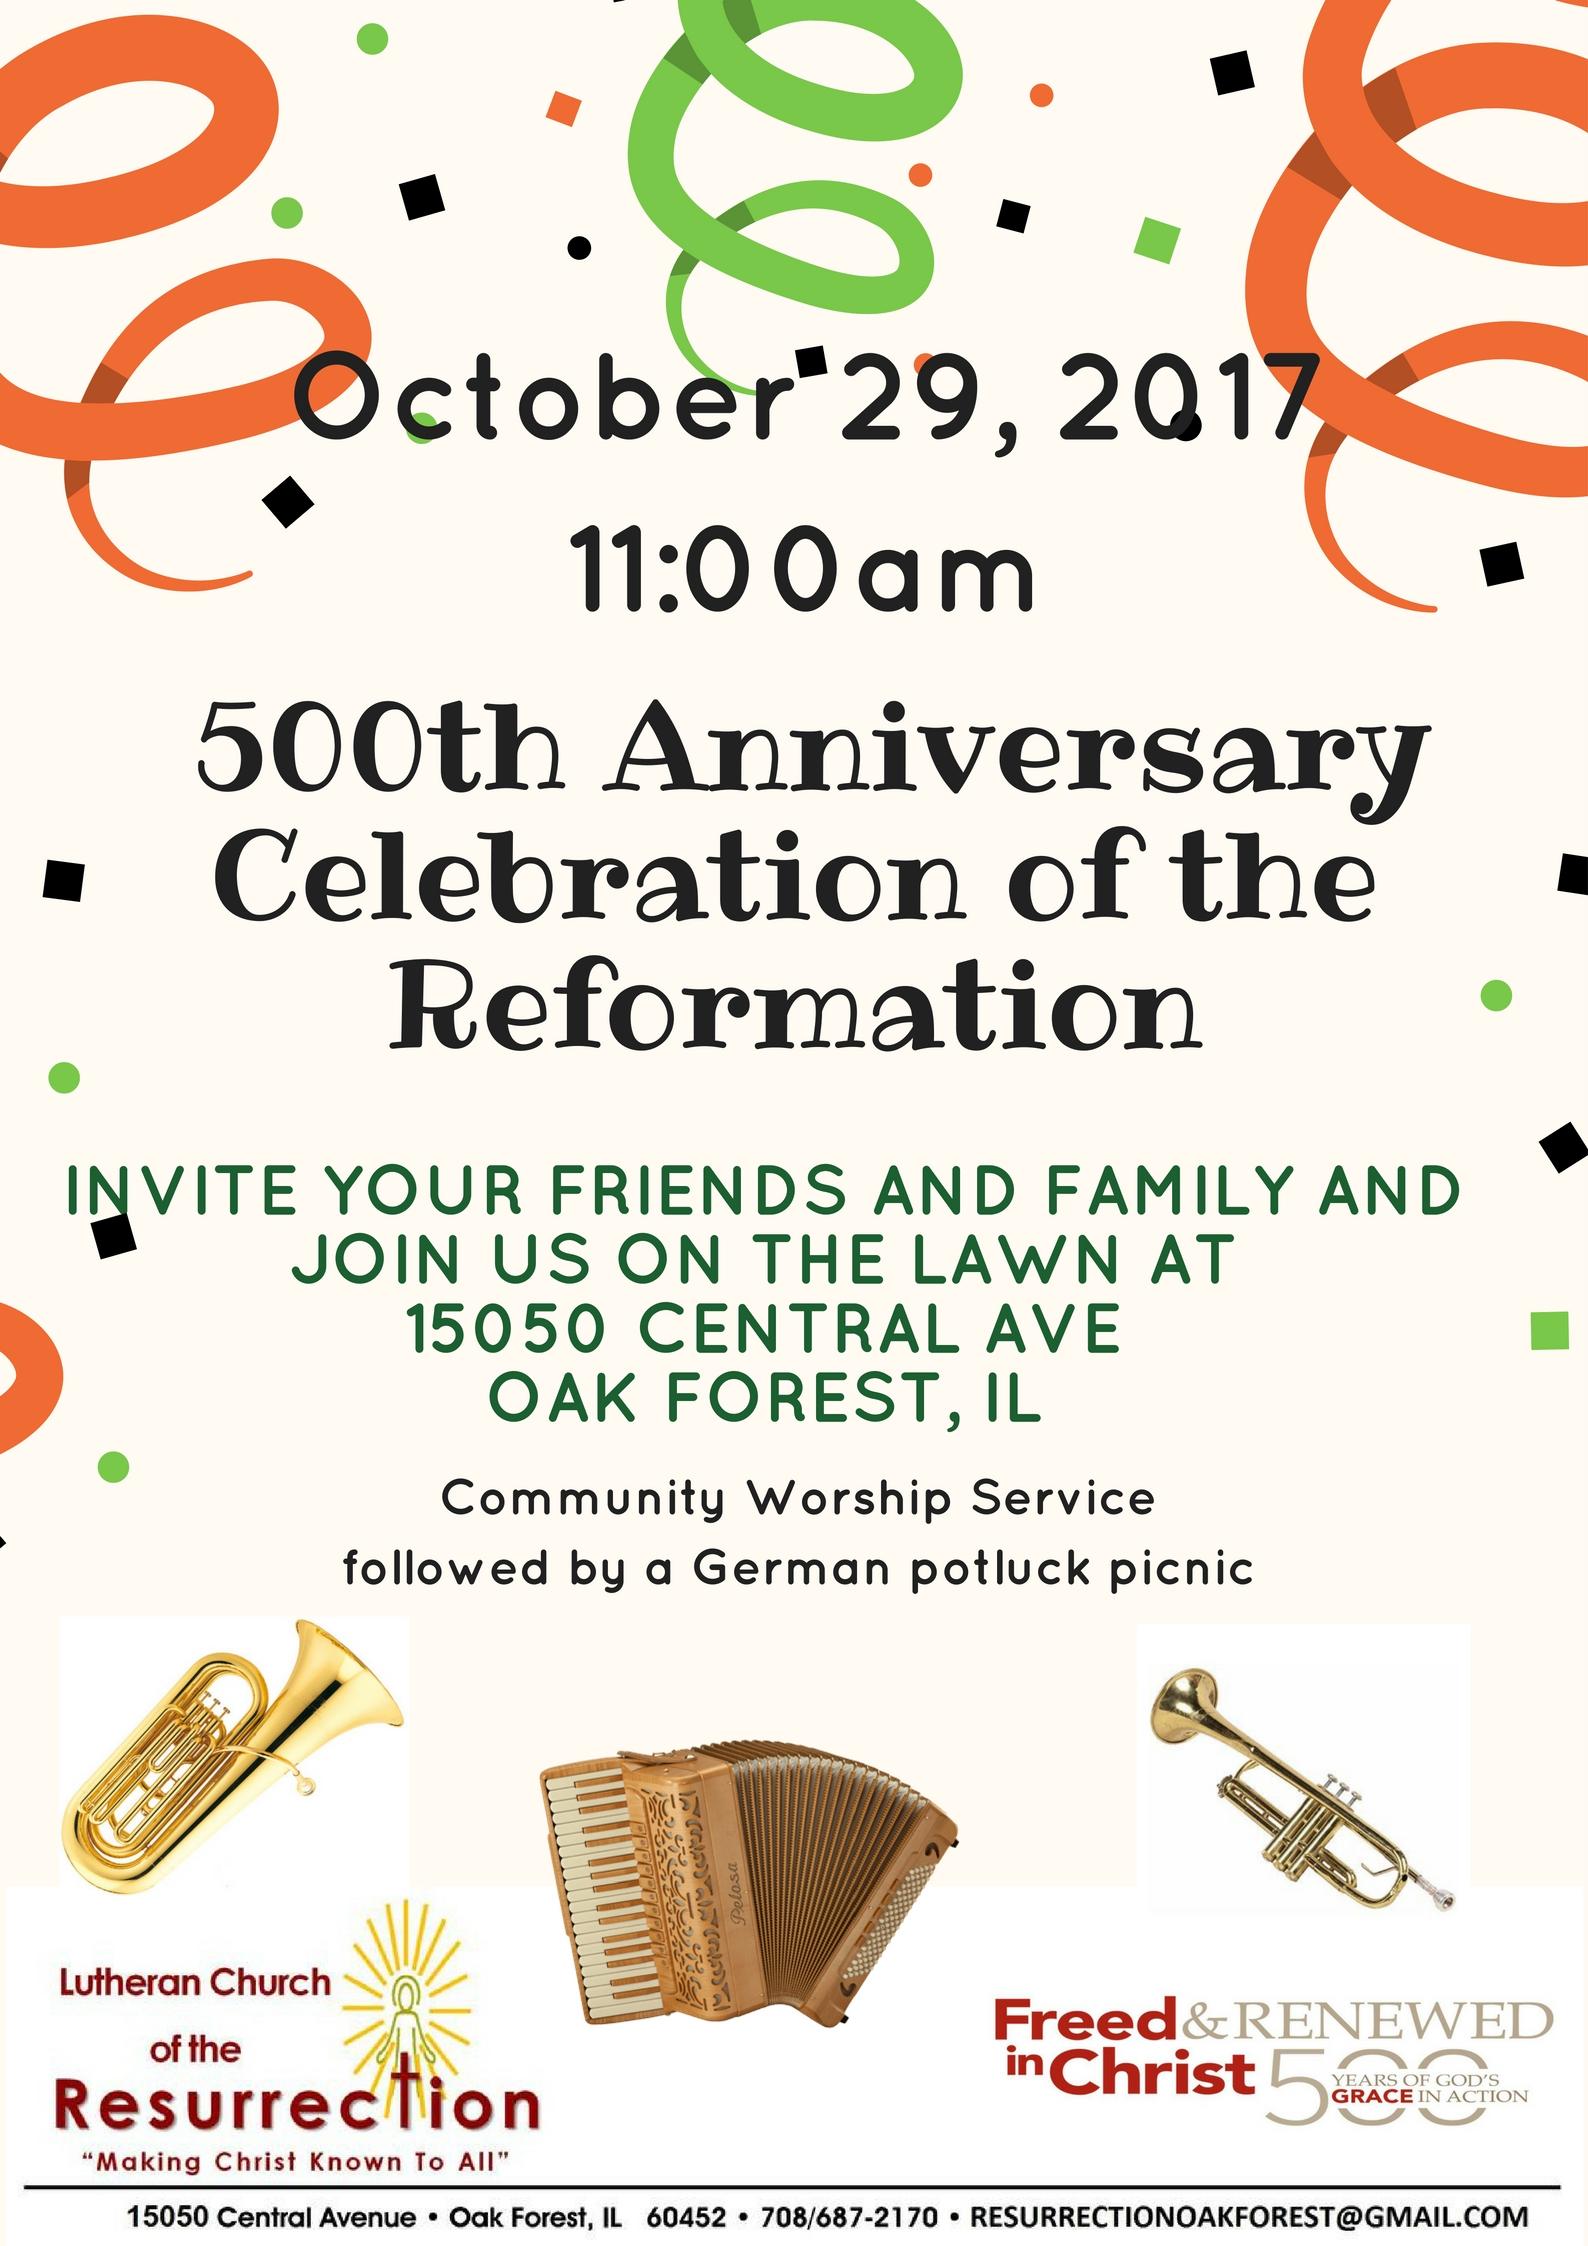 LCR 500 Reformation Celebration flyer